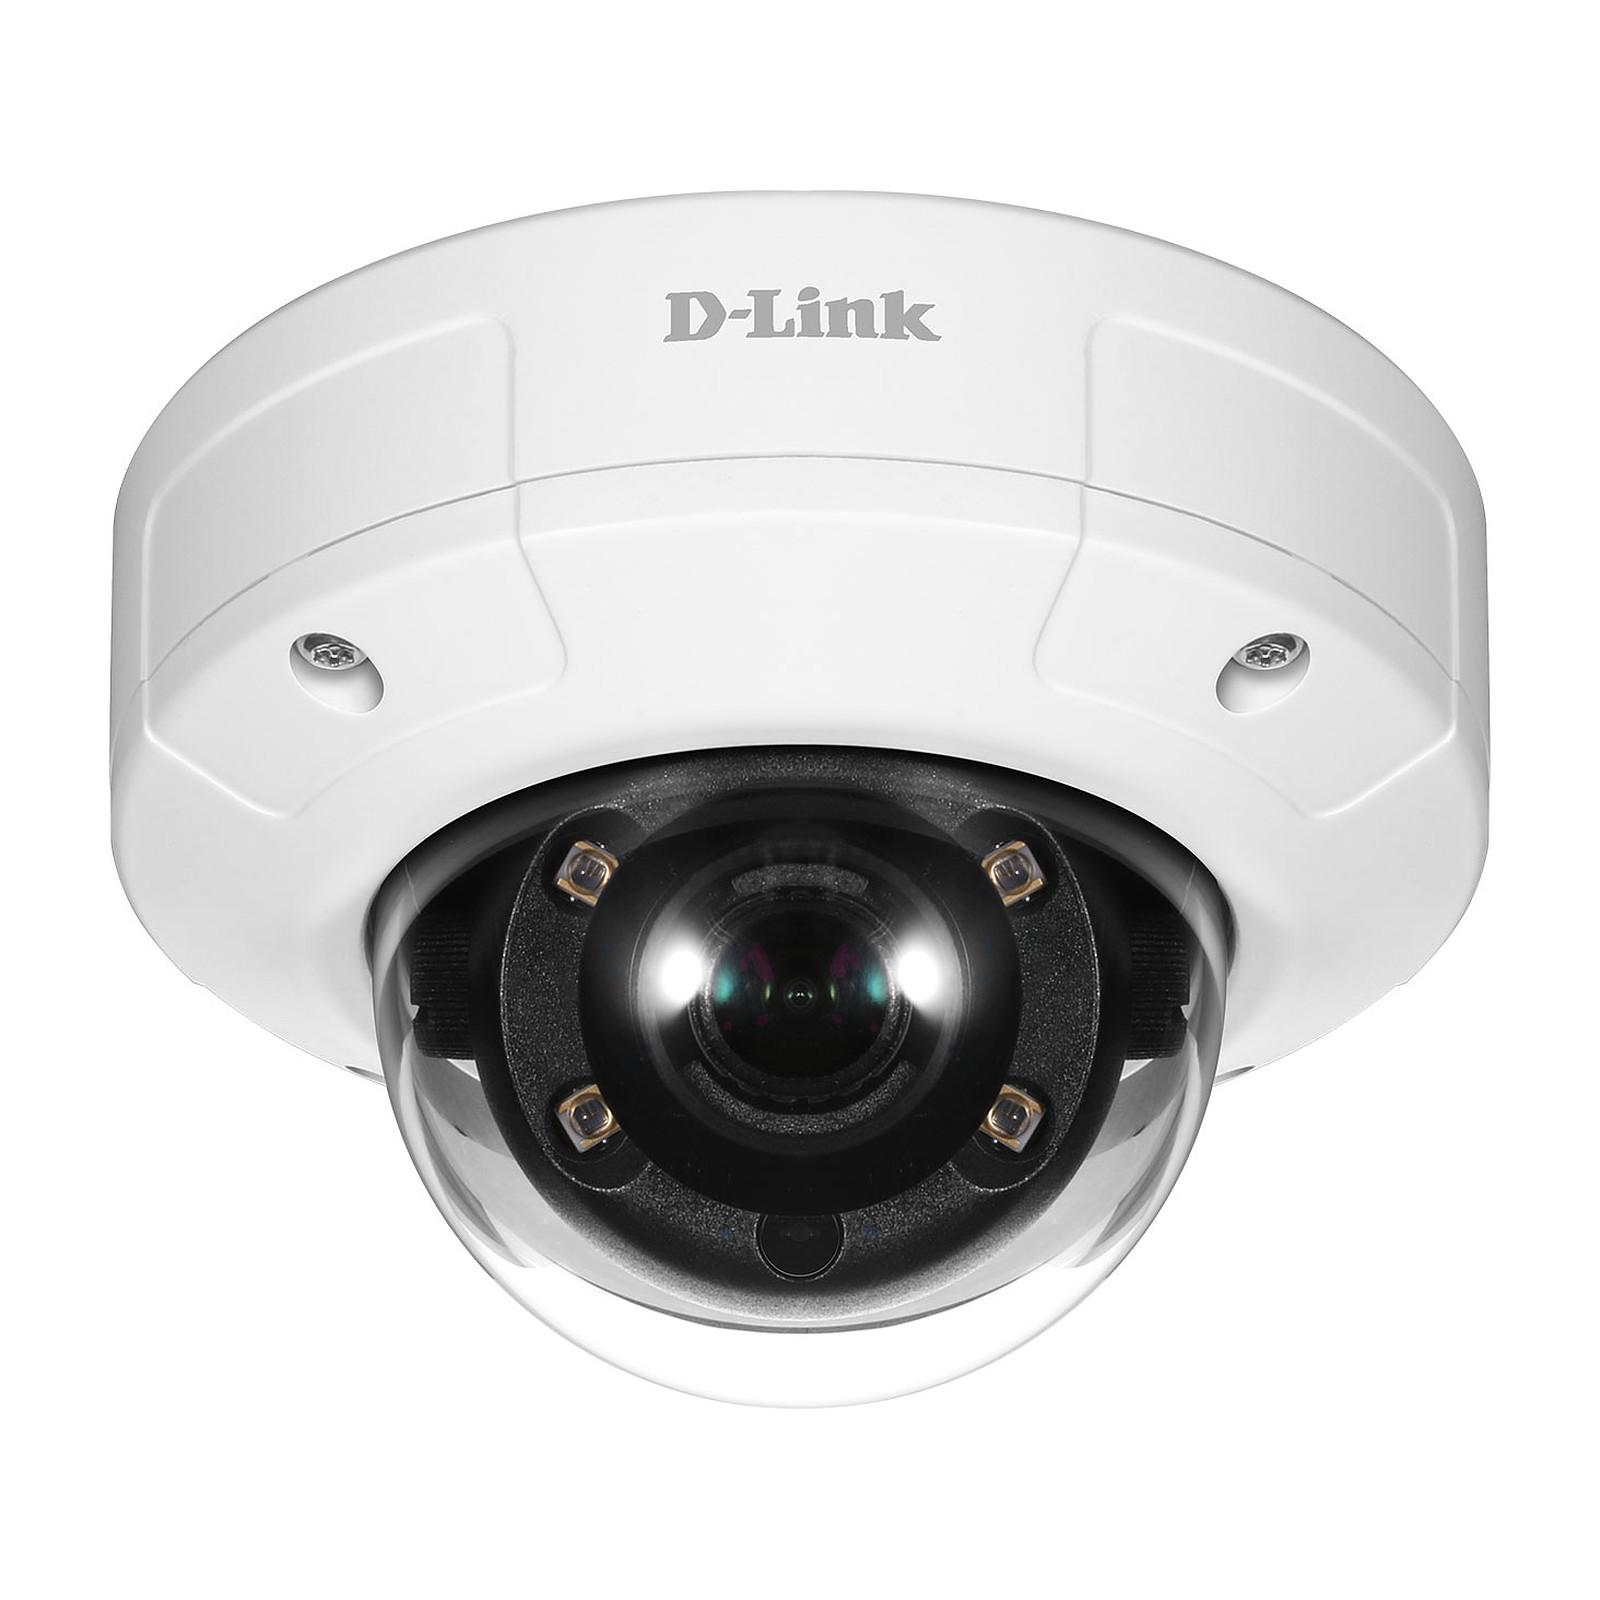 D-Link DCS-4633EV